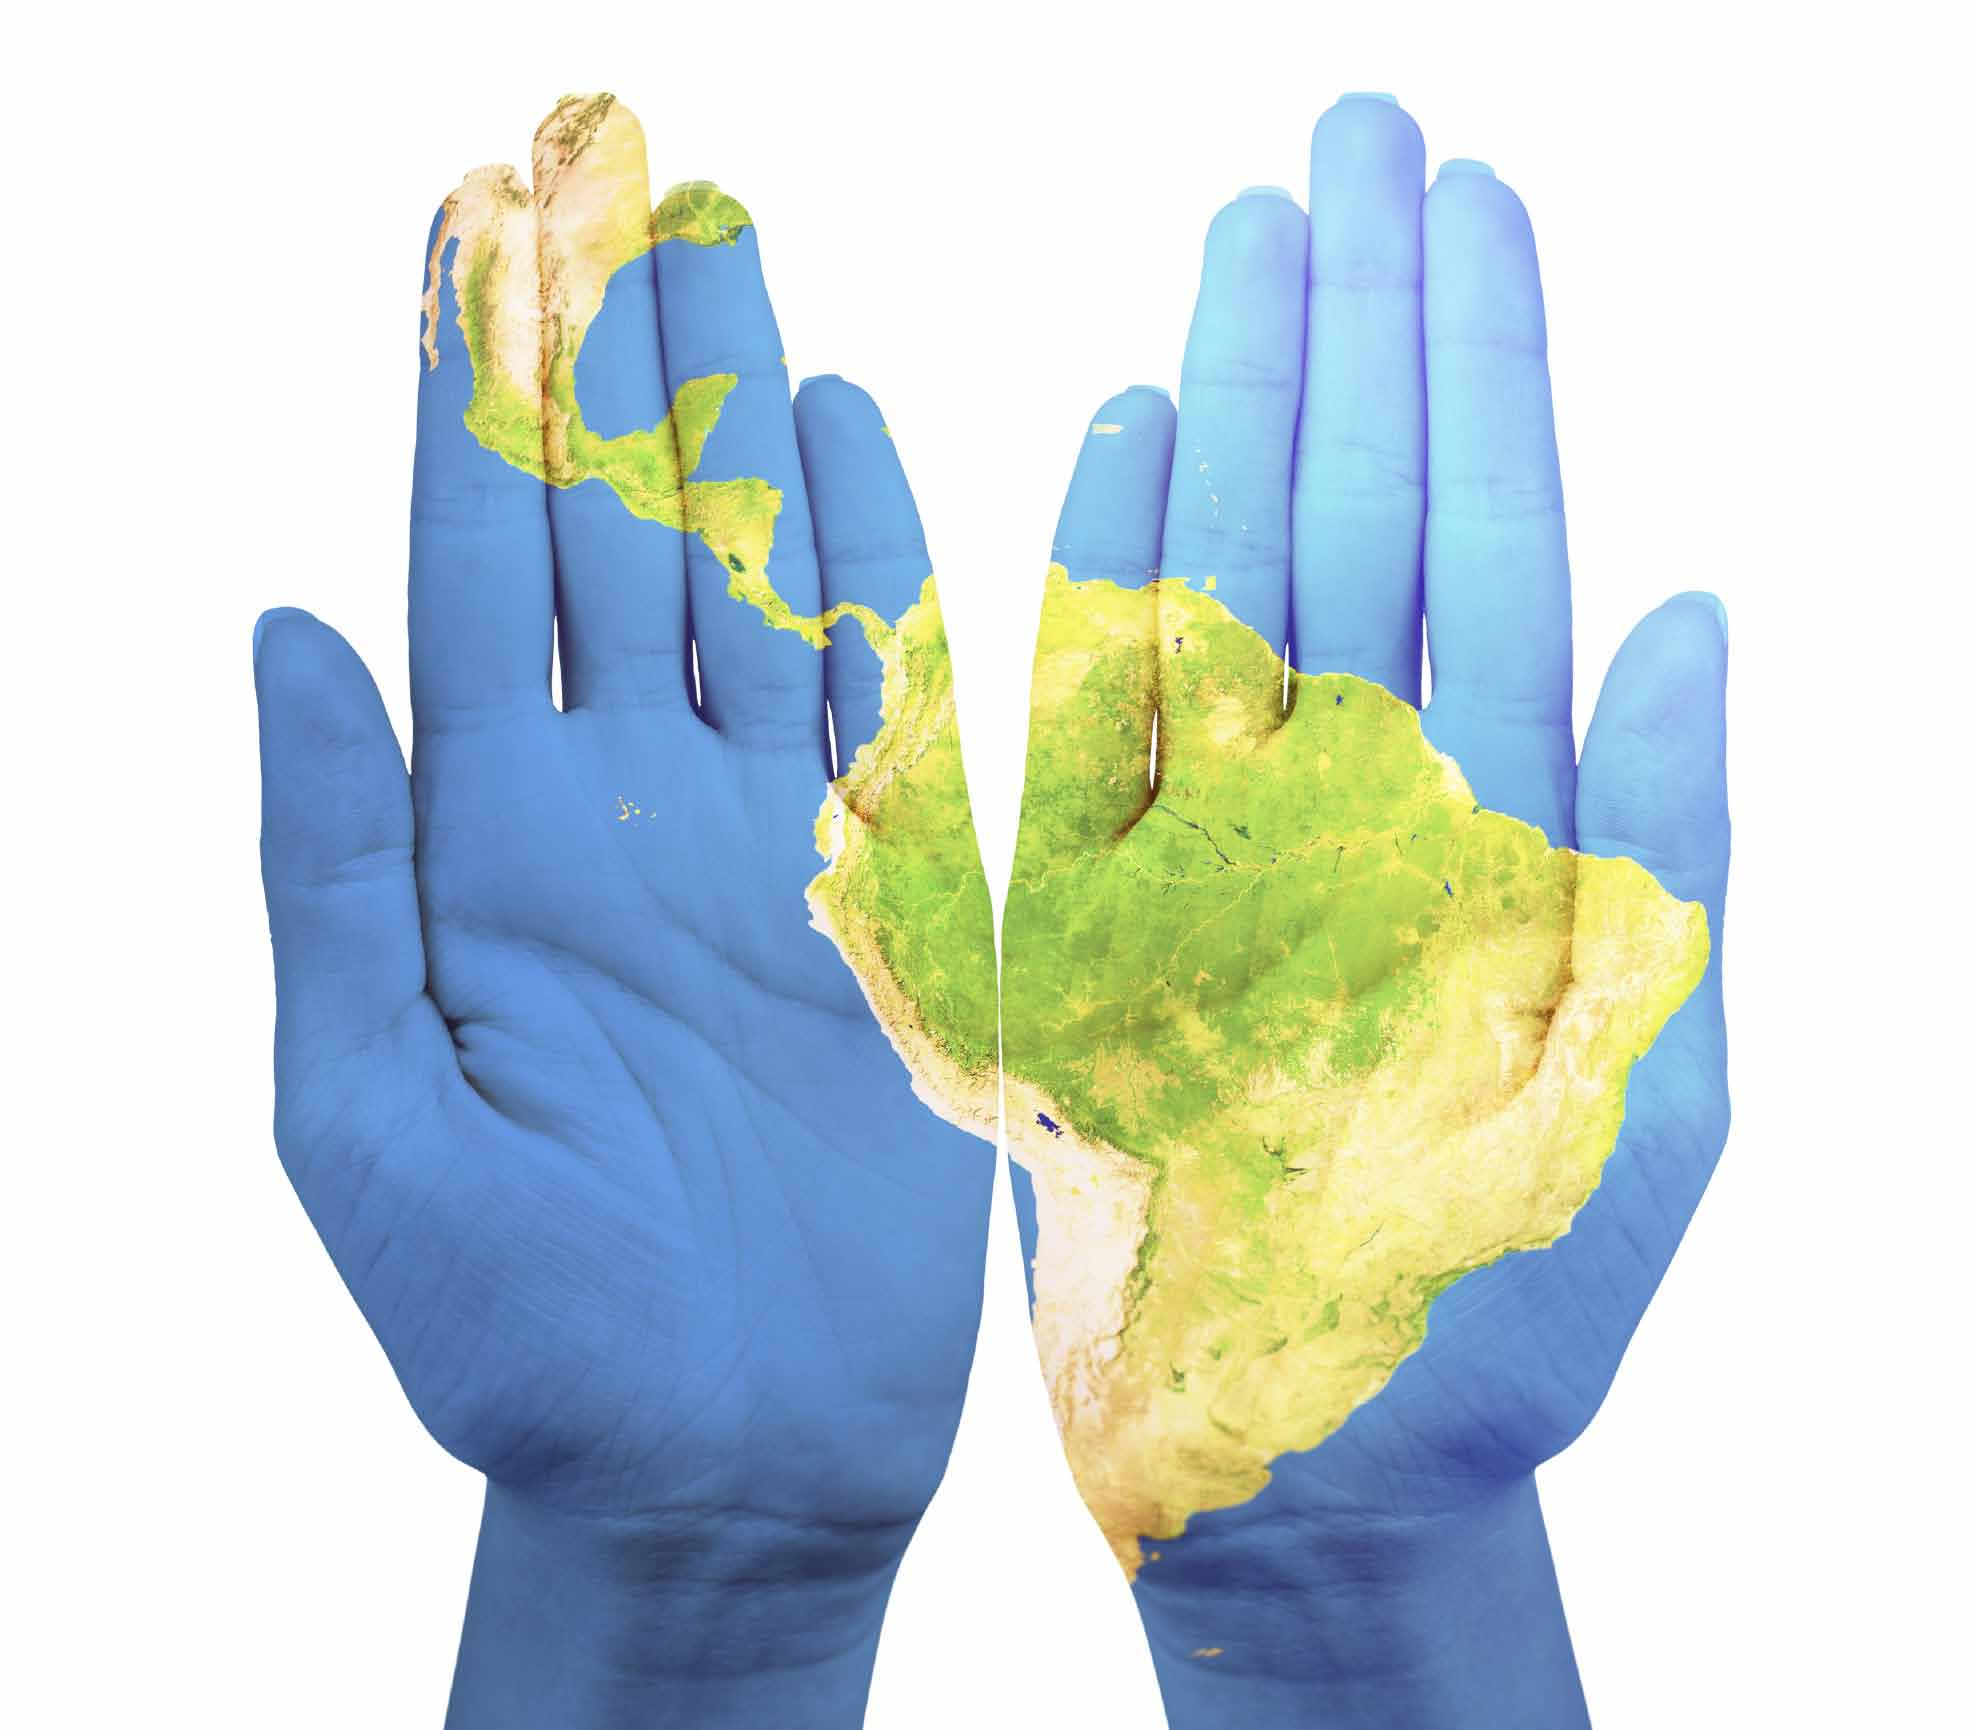 Latin American Bioethics